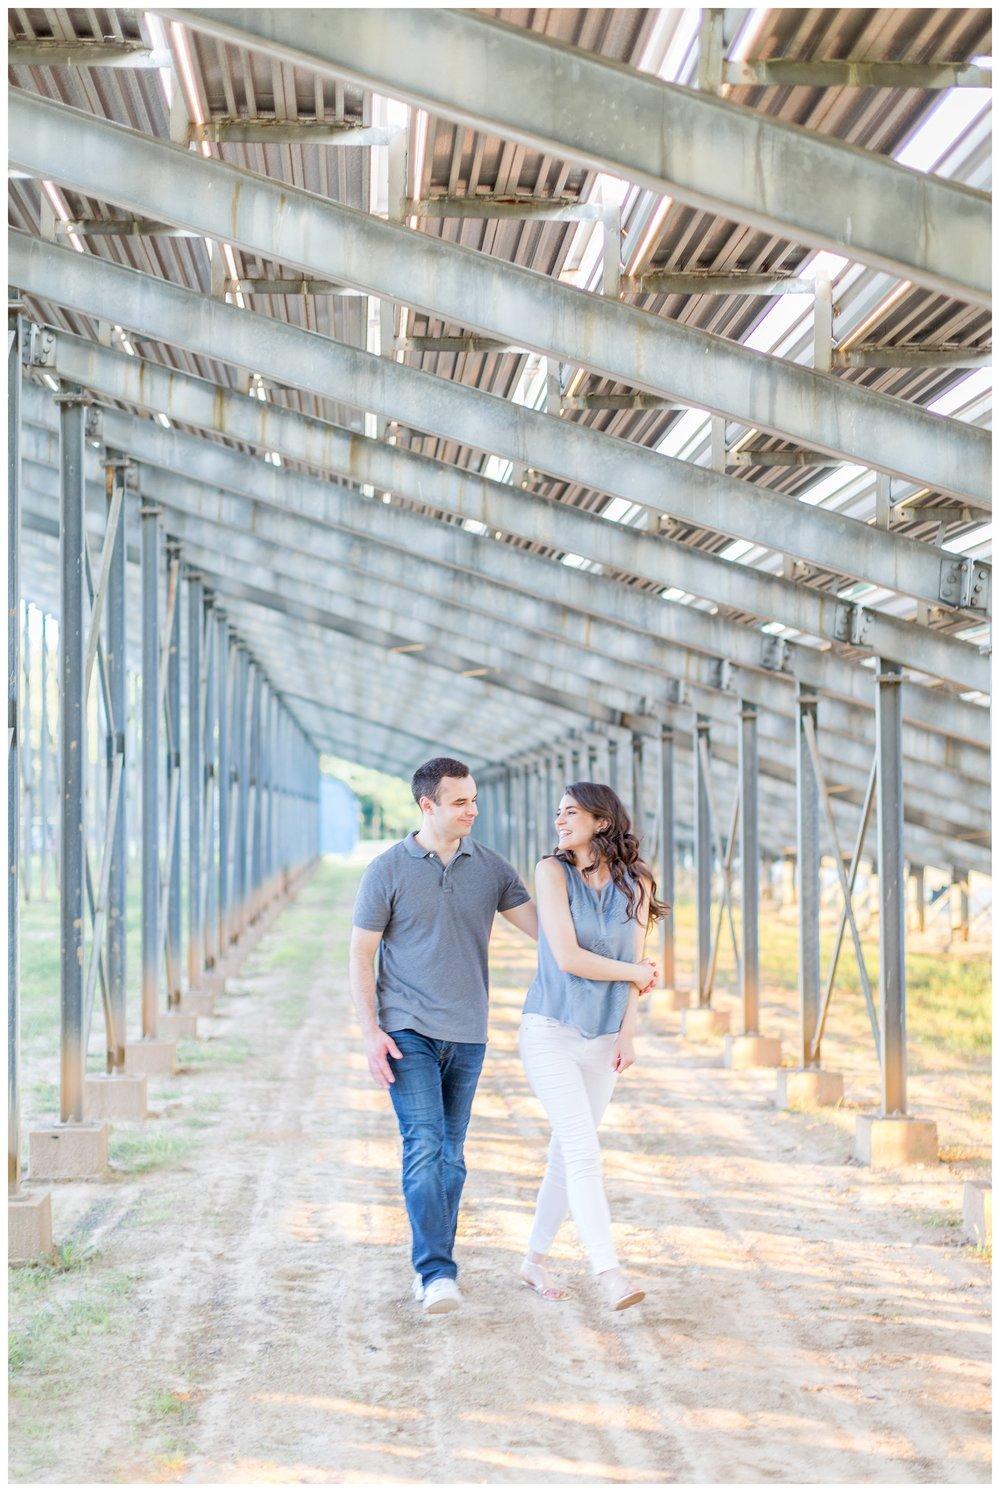 Meadowlark Botanical Garden Engagement | Virginia Wedding Photographer Kir Tuben_0056.jpg